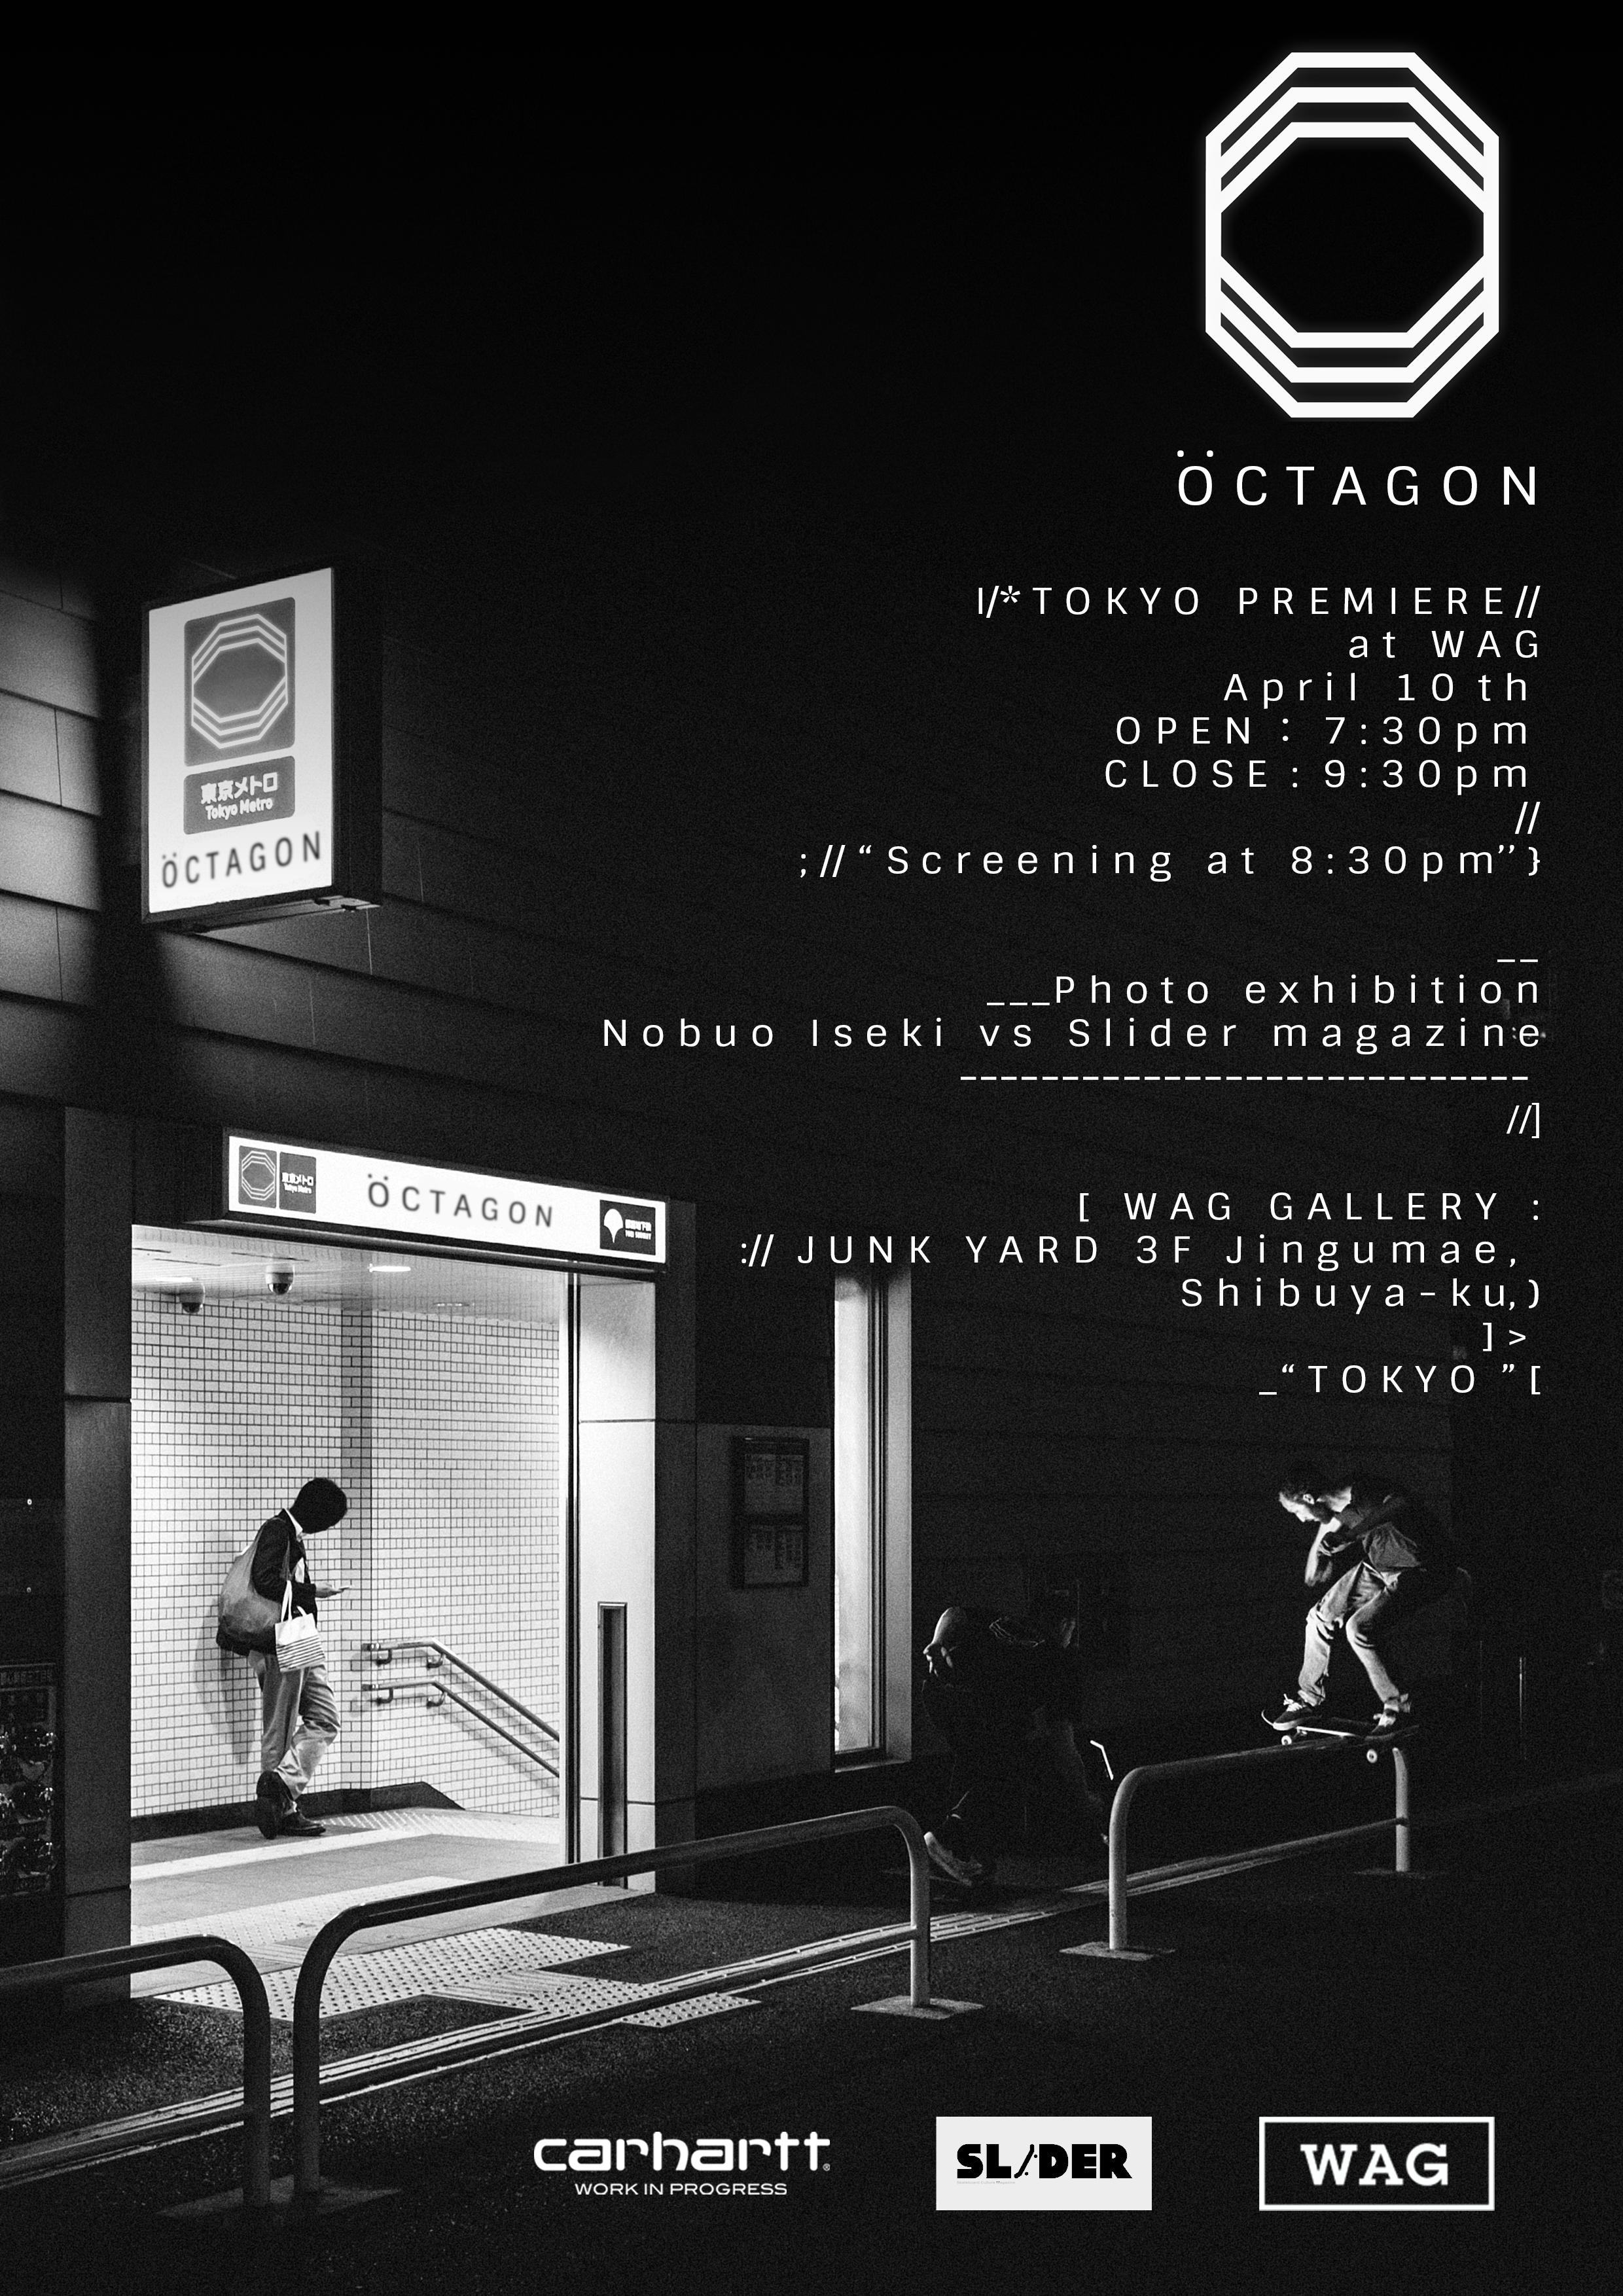 flyer_web_o?ctagon_tokyo